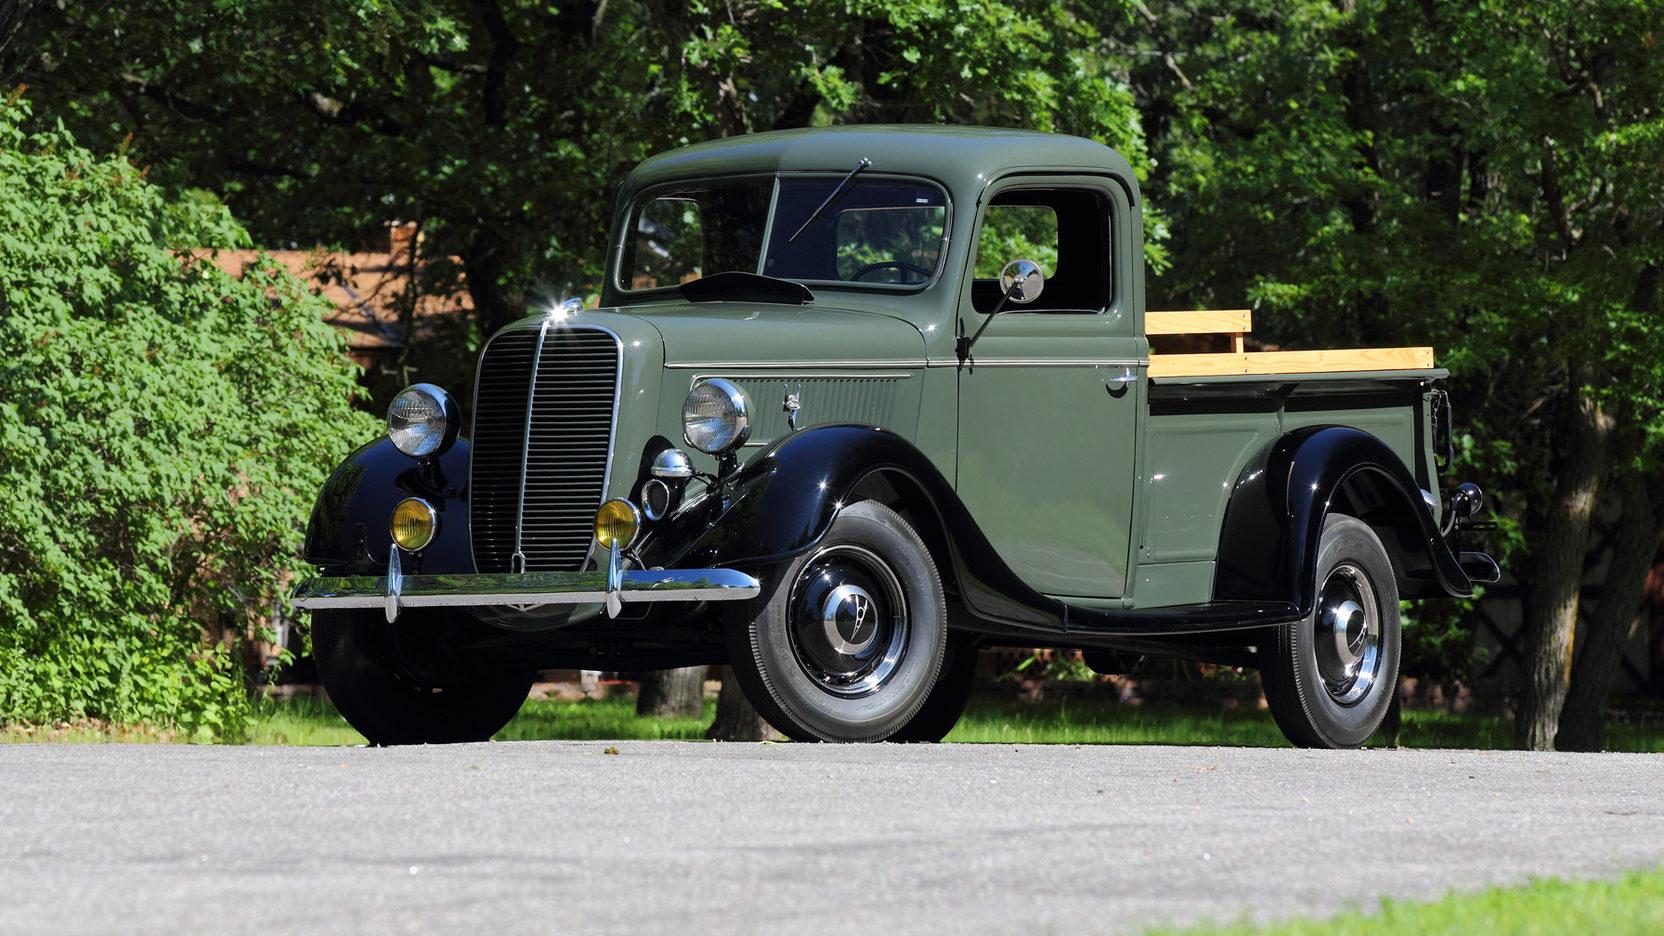 1937 Ford Model 73 1/2 Ton Pickup